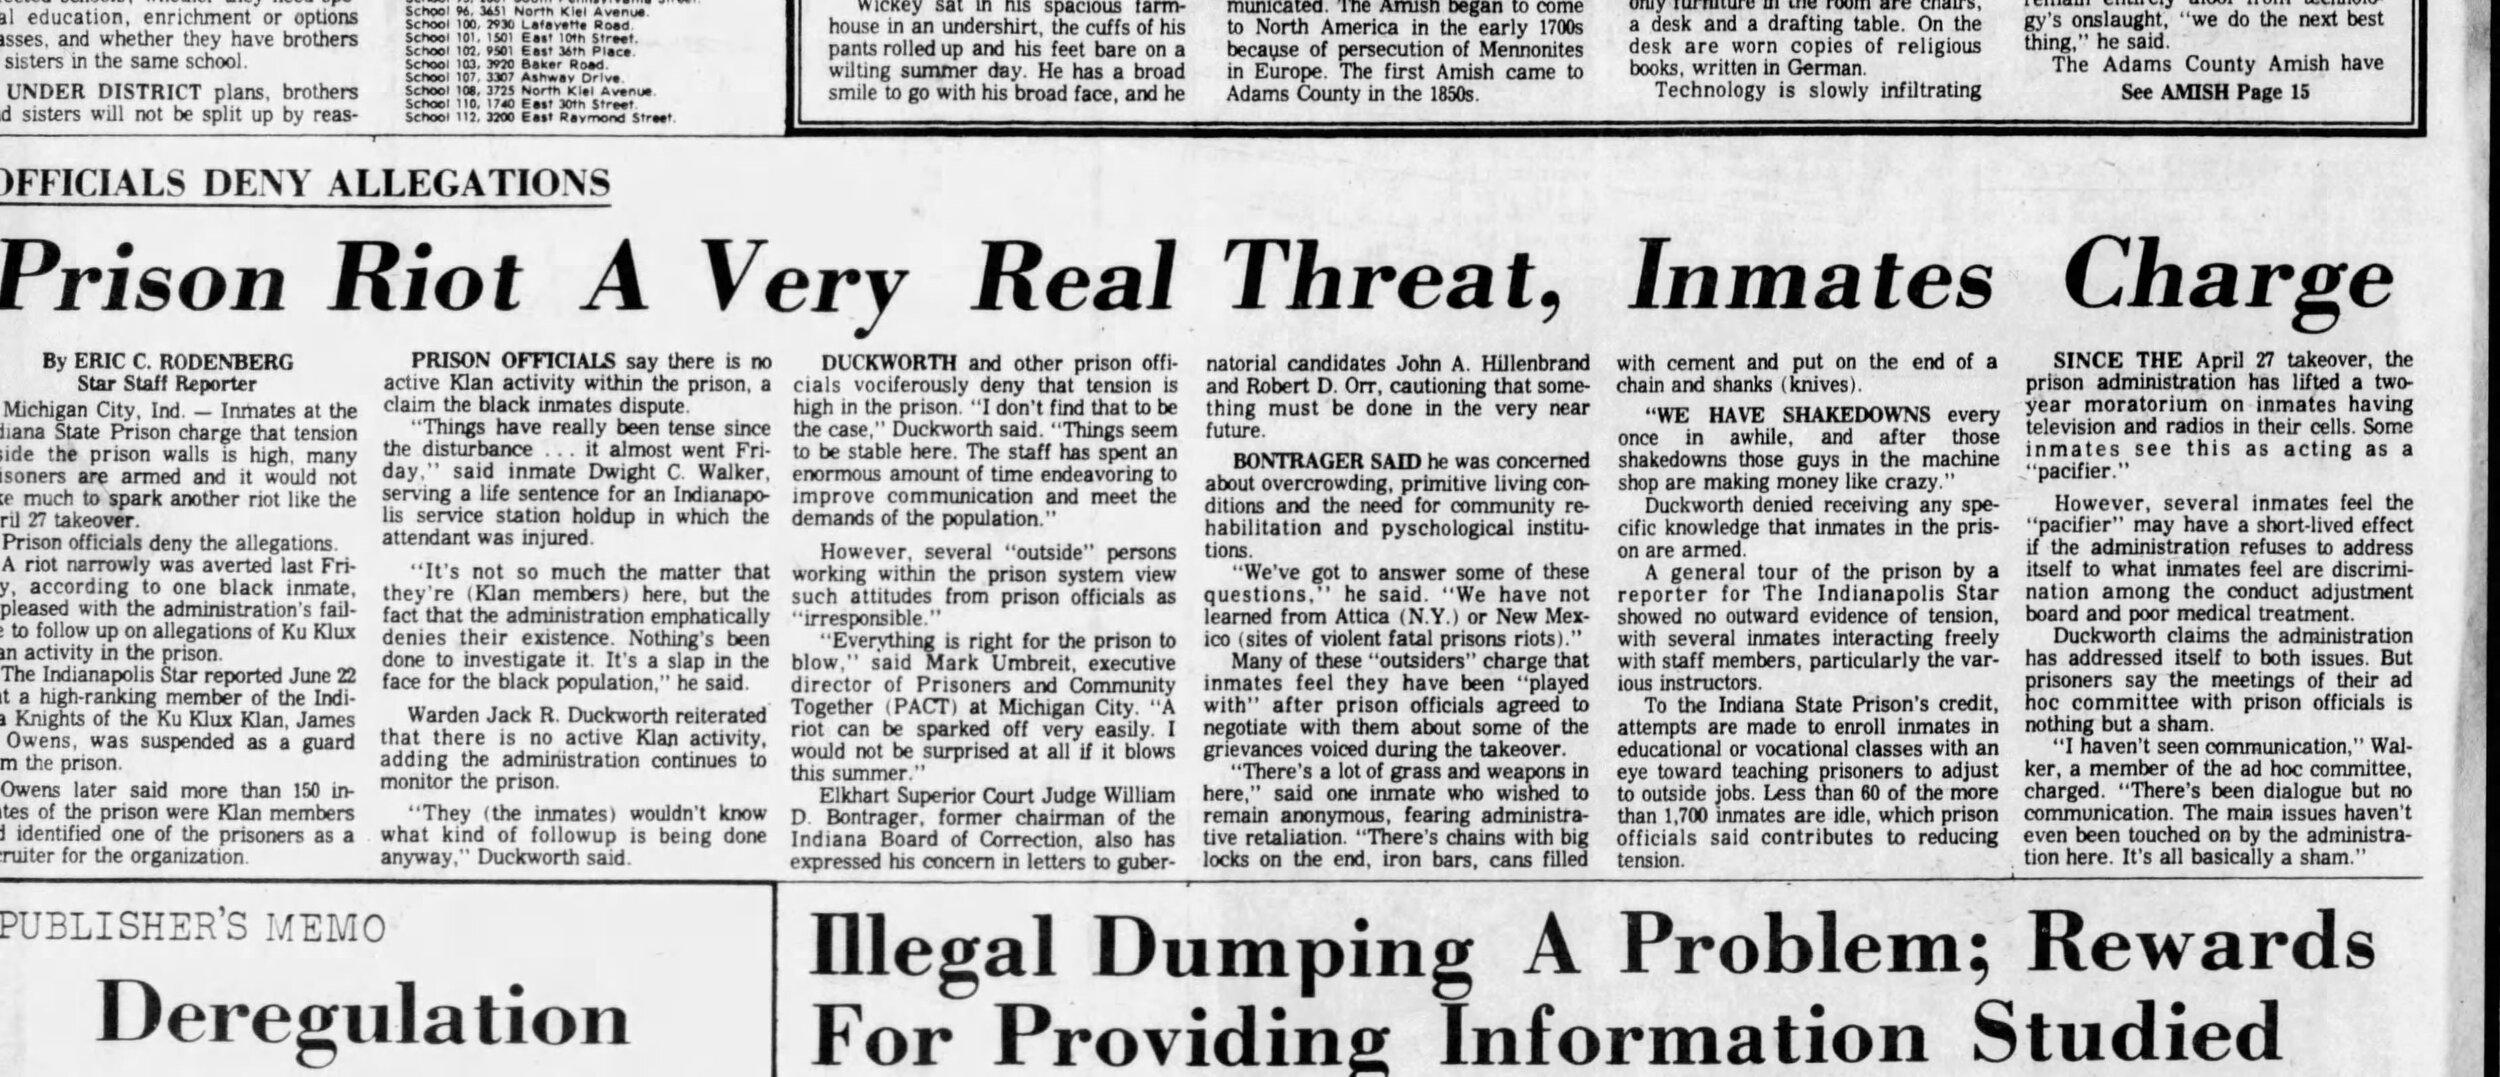 The_Indianapolis_Star_Sun__Jul_6__1980_1.jpg